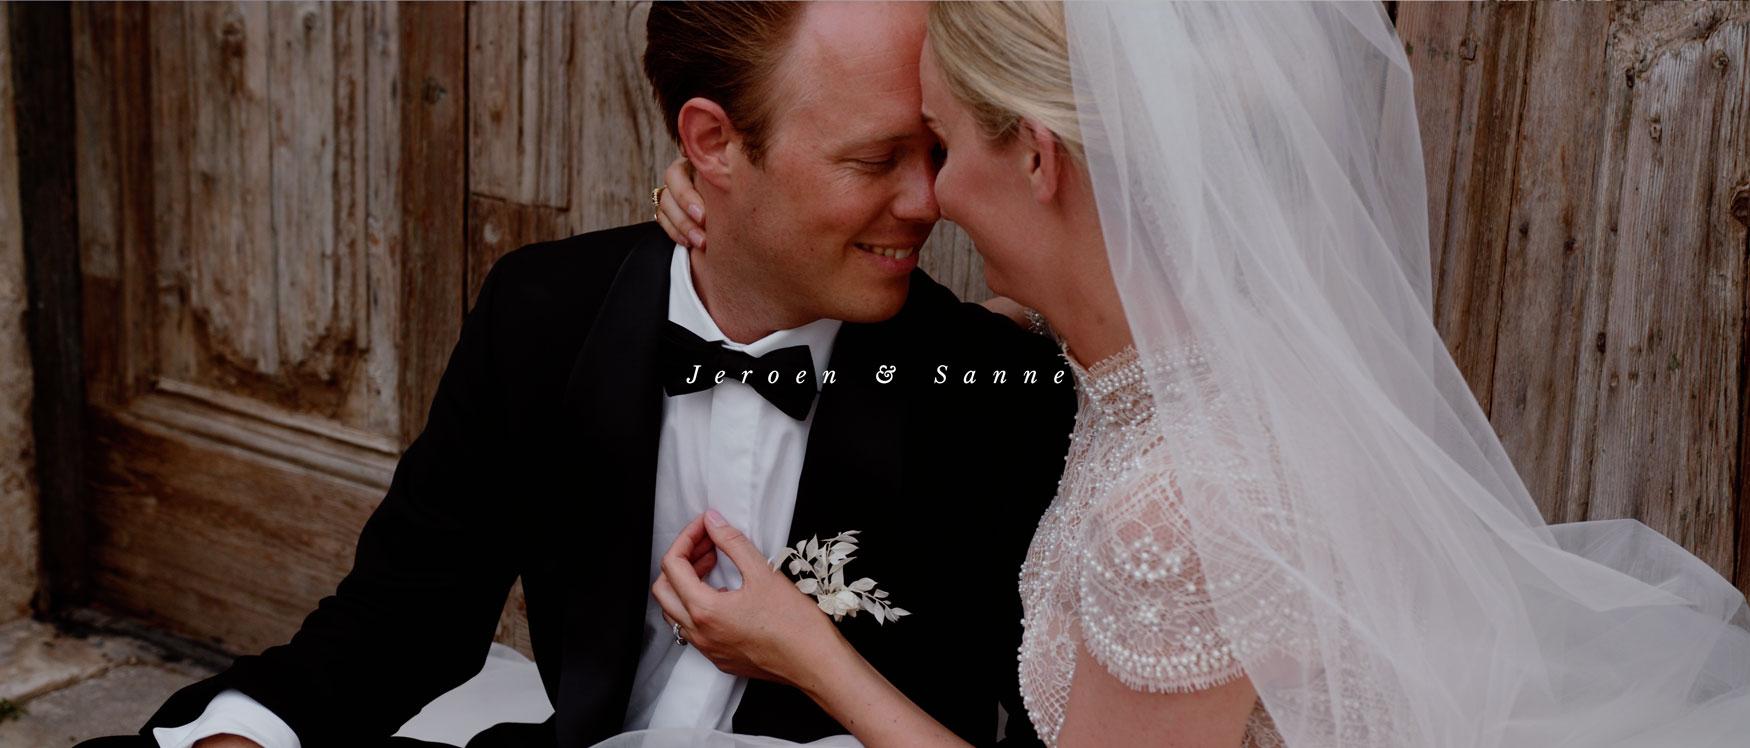 jeroen-sanne-wedding-ostuni-puglia-bruiloft-videograaf-trouwfilm-videographer-dreamers-amsterdam-trouwvideo-destination-wedding-web